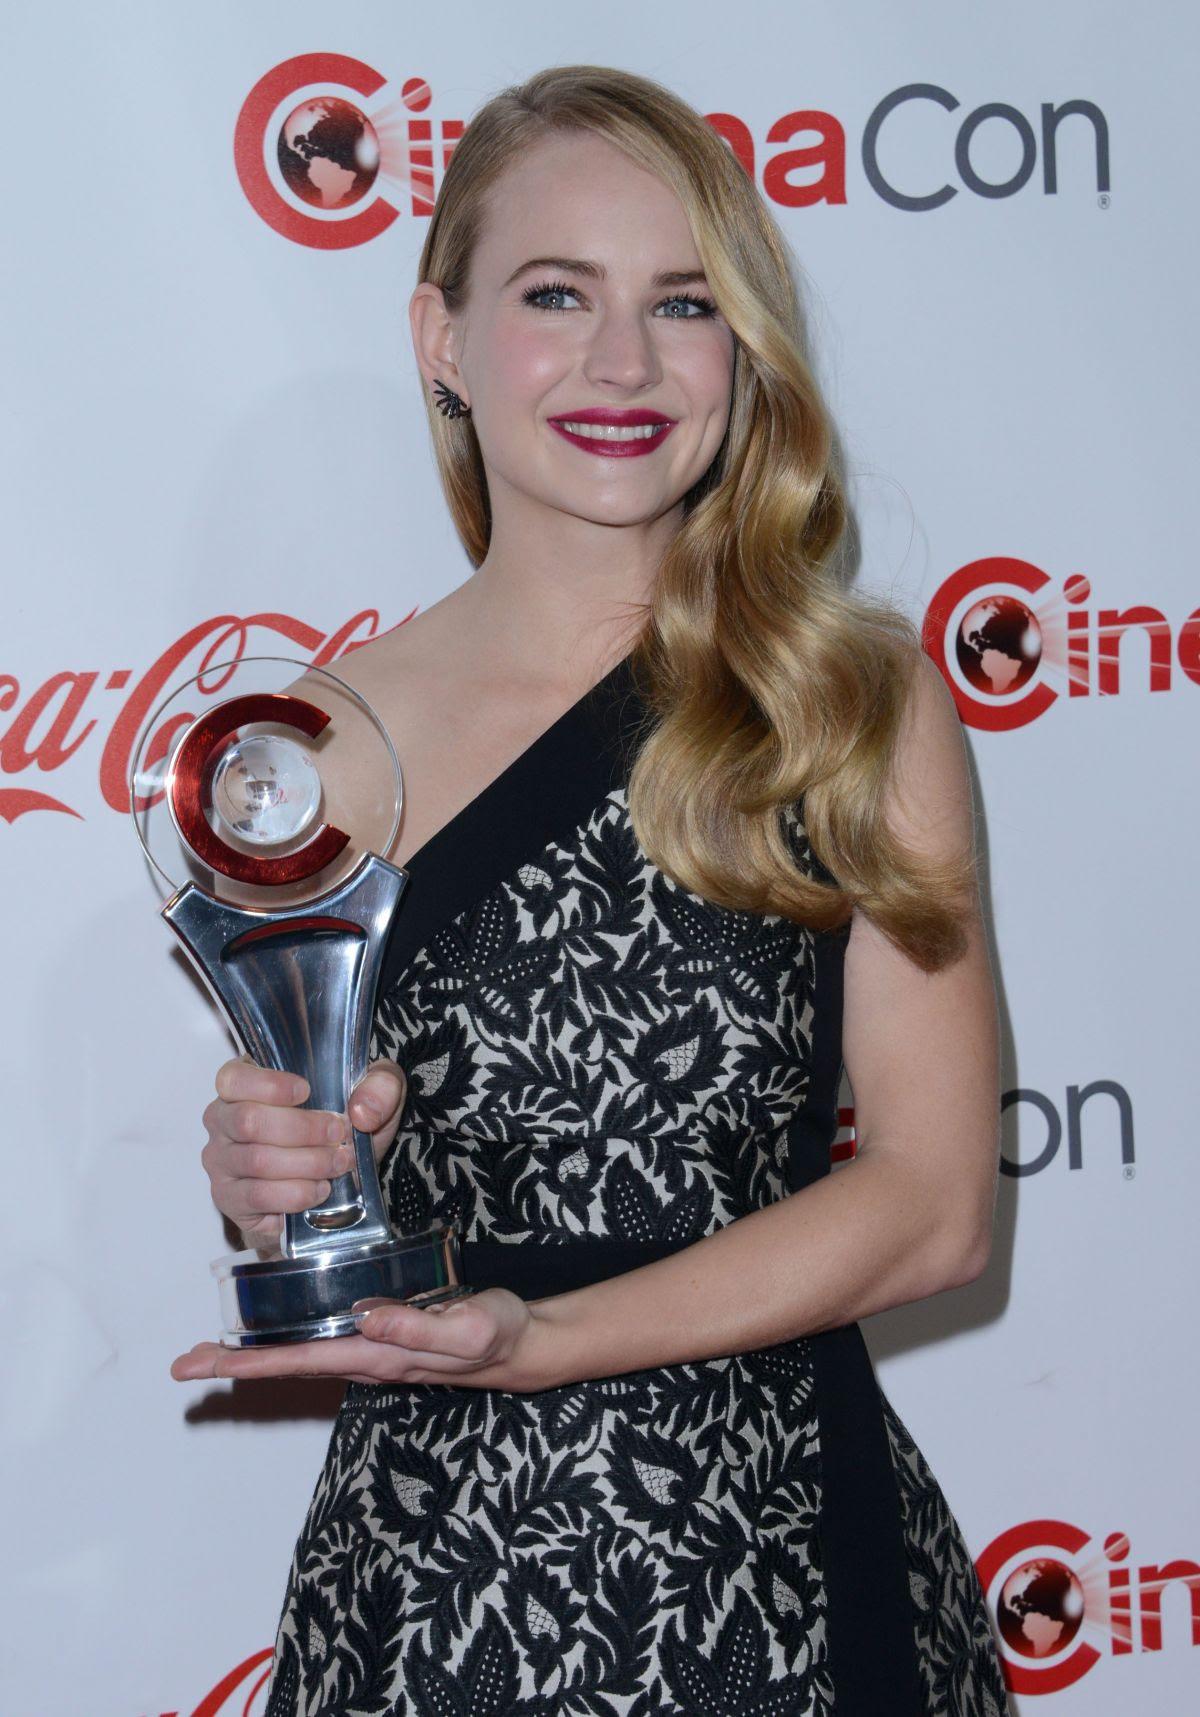 BRITT ROBERTSON at Cinemacon Big Screen Achievement Awards in Las Vegas